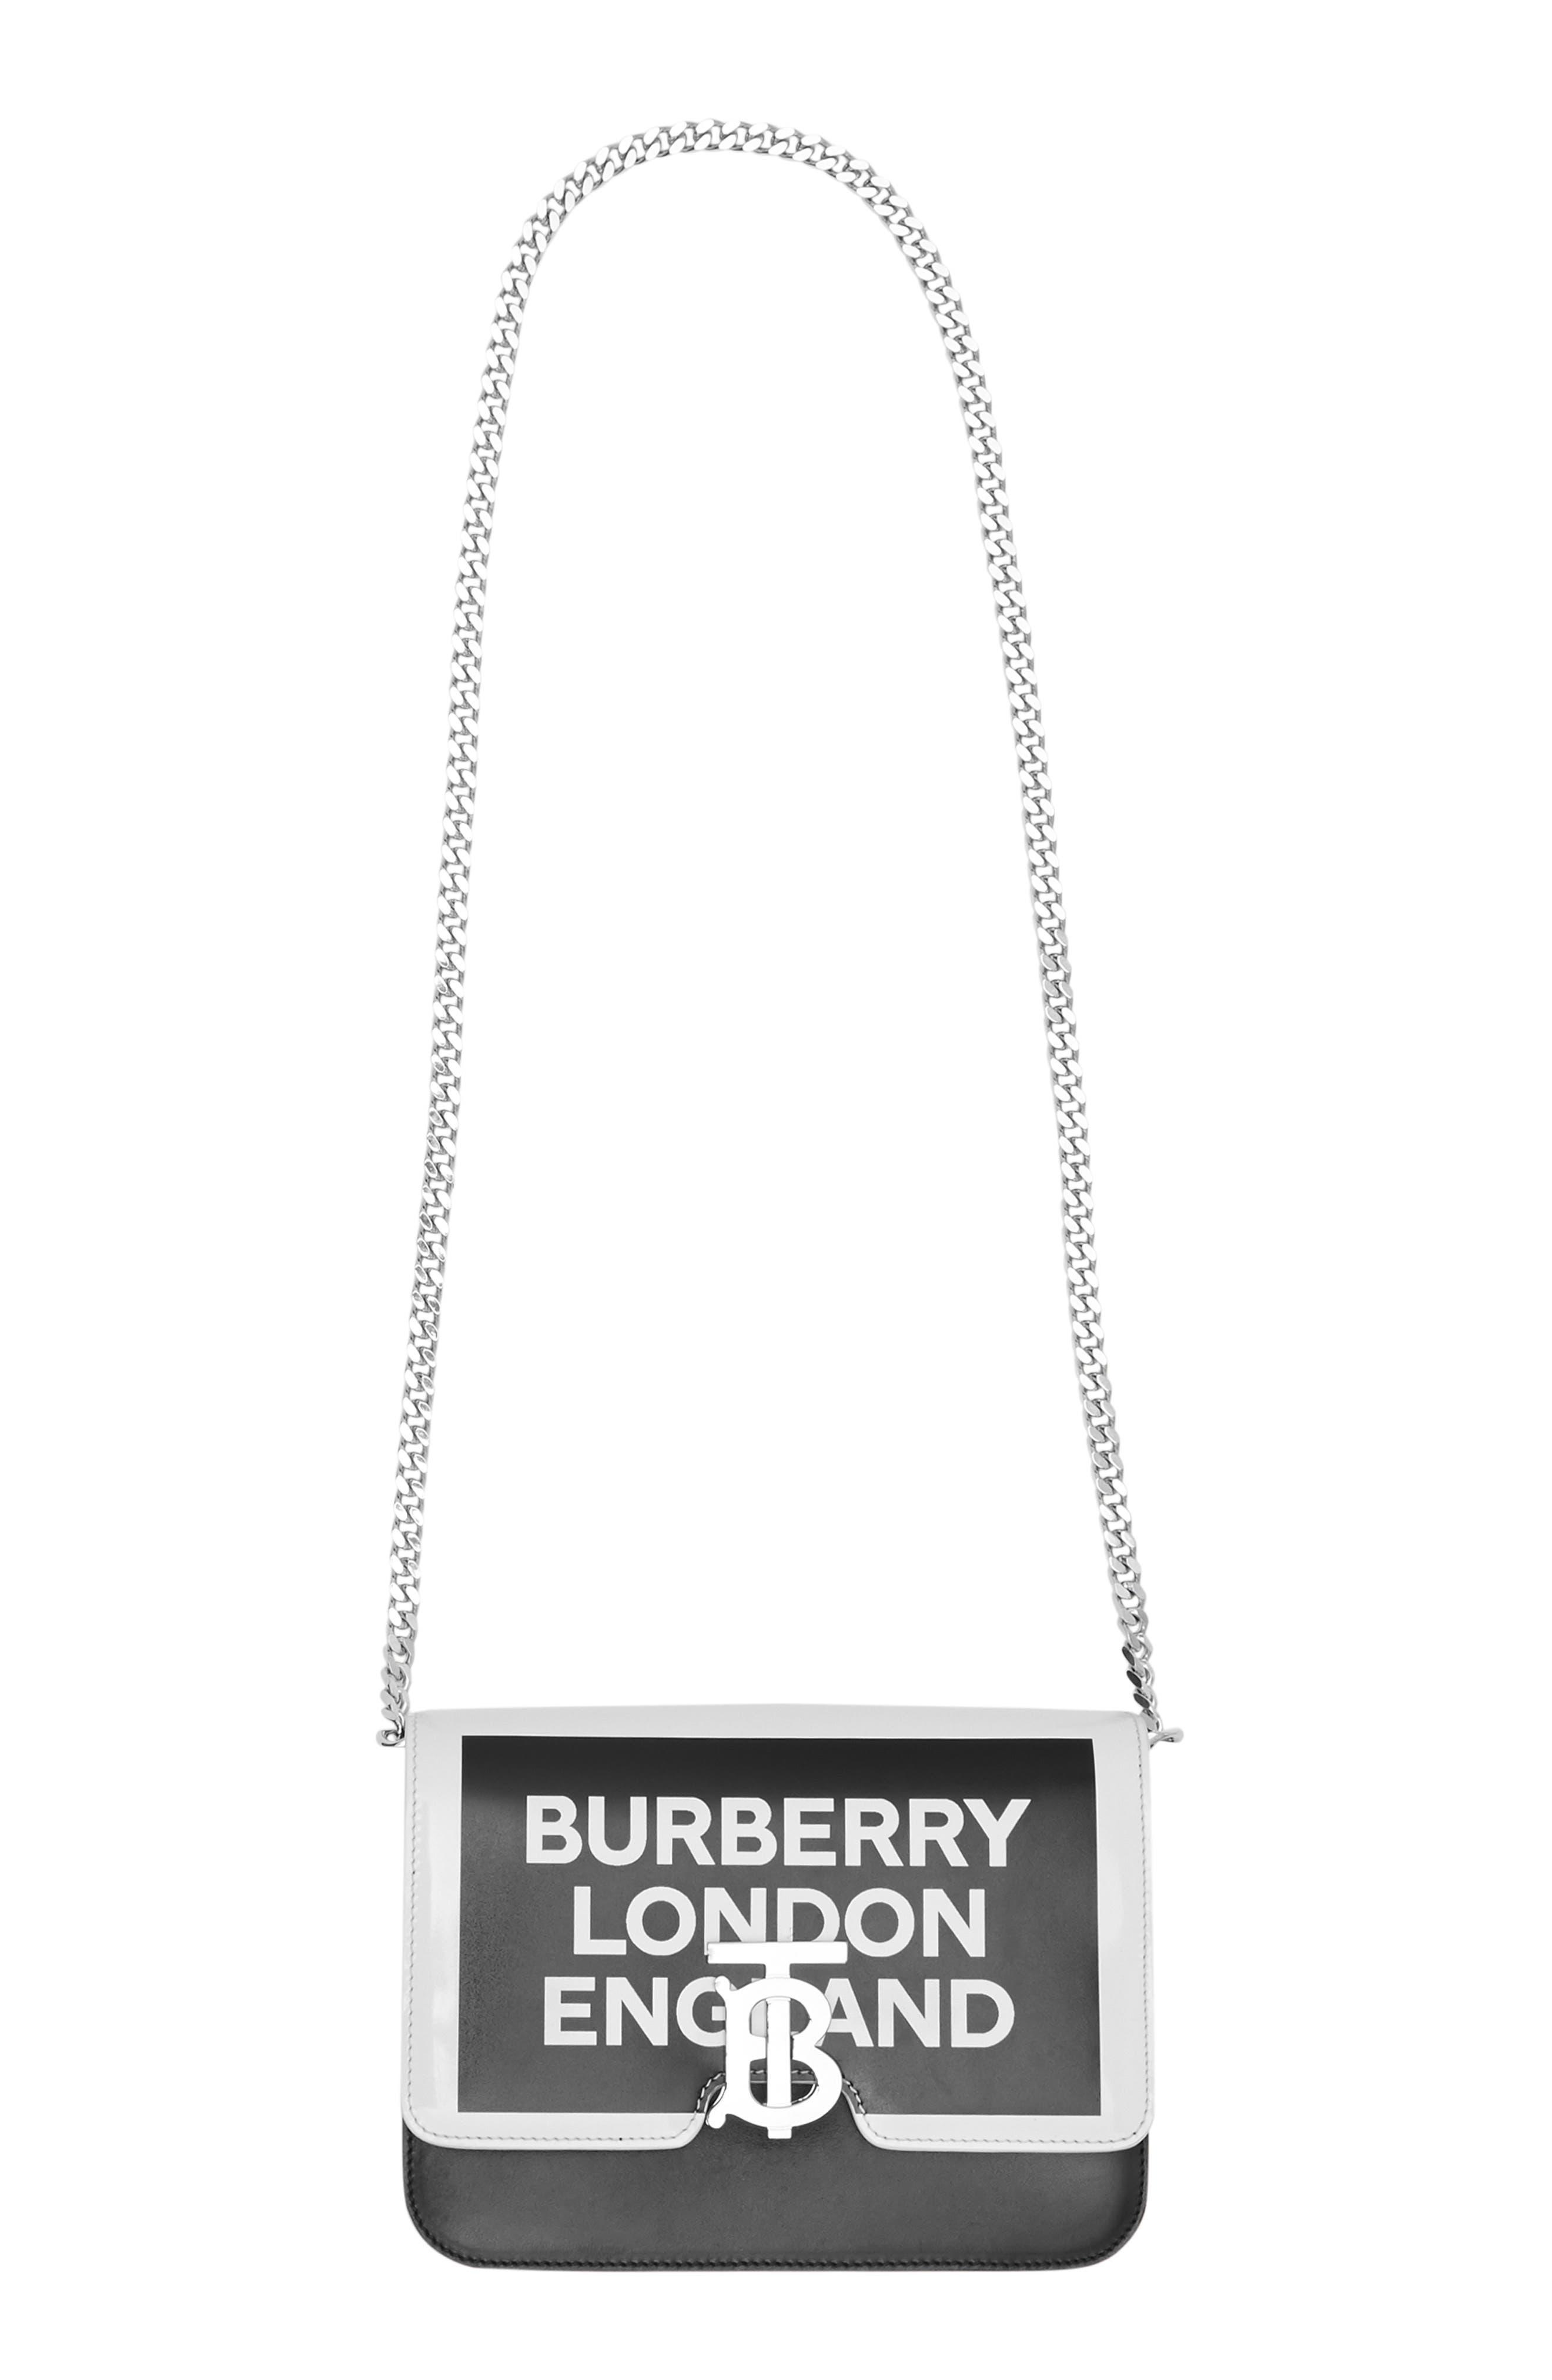 BURBERRY,                             Small Painted Edge Logo TB Crossbody Bag,                             Main thumbnail 1, color,                             BLACK/ WHITE